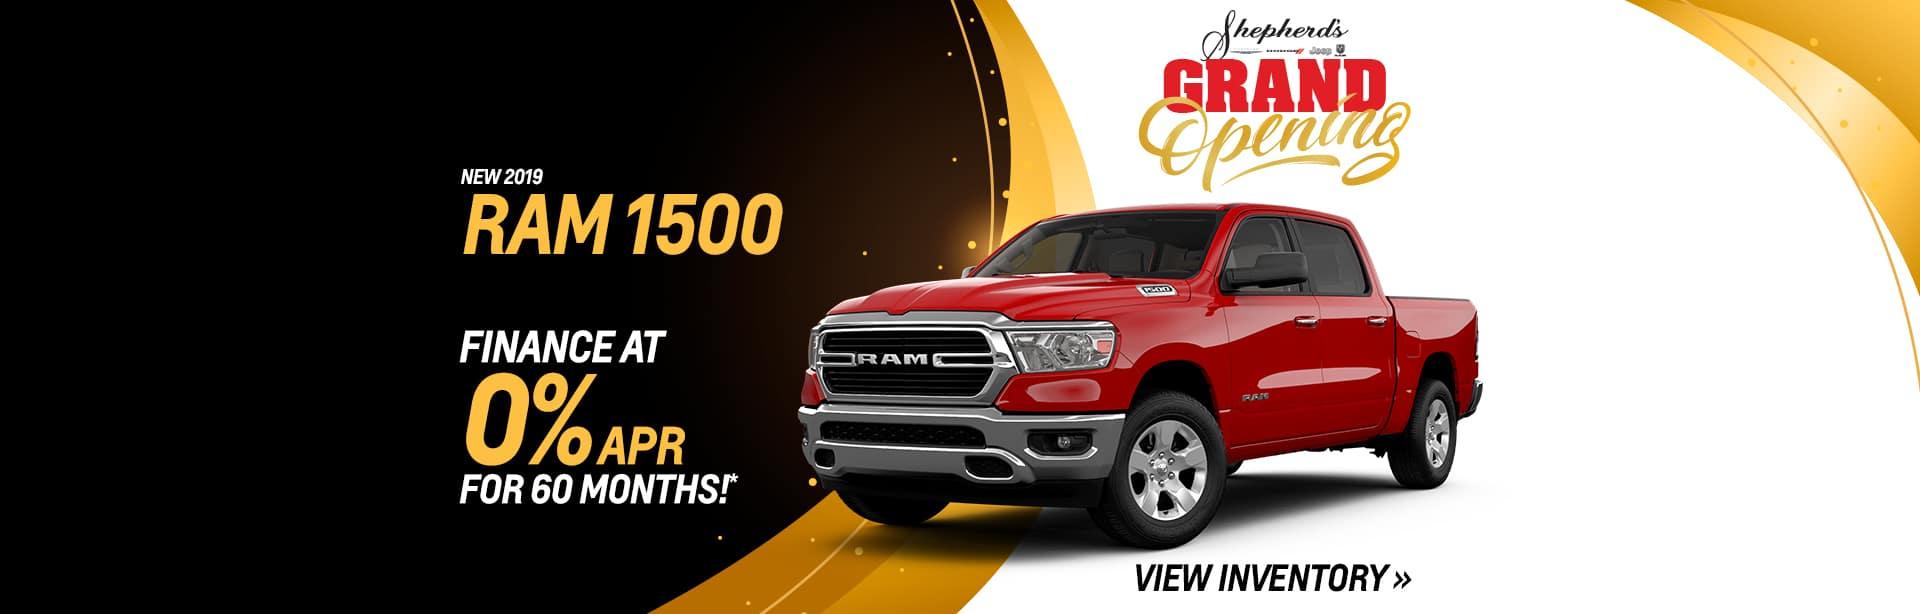 Finance a New RAM 1500 Truck at 0% APR.